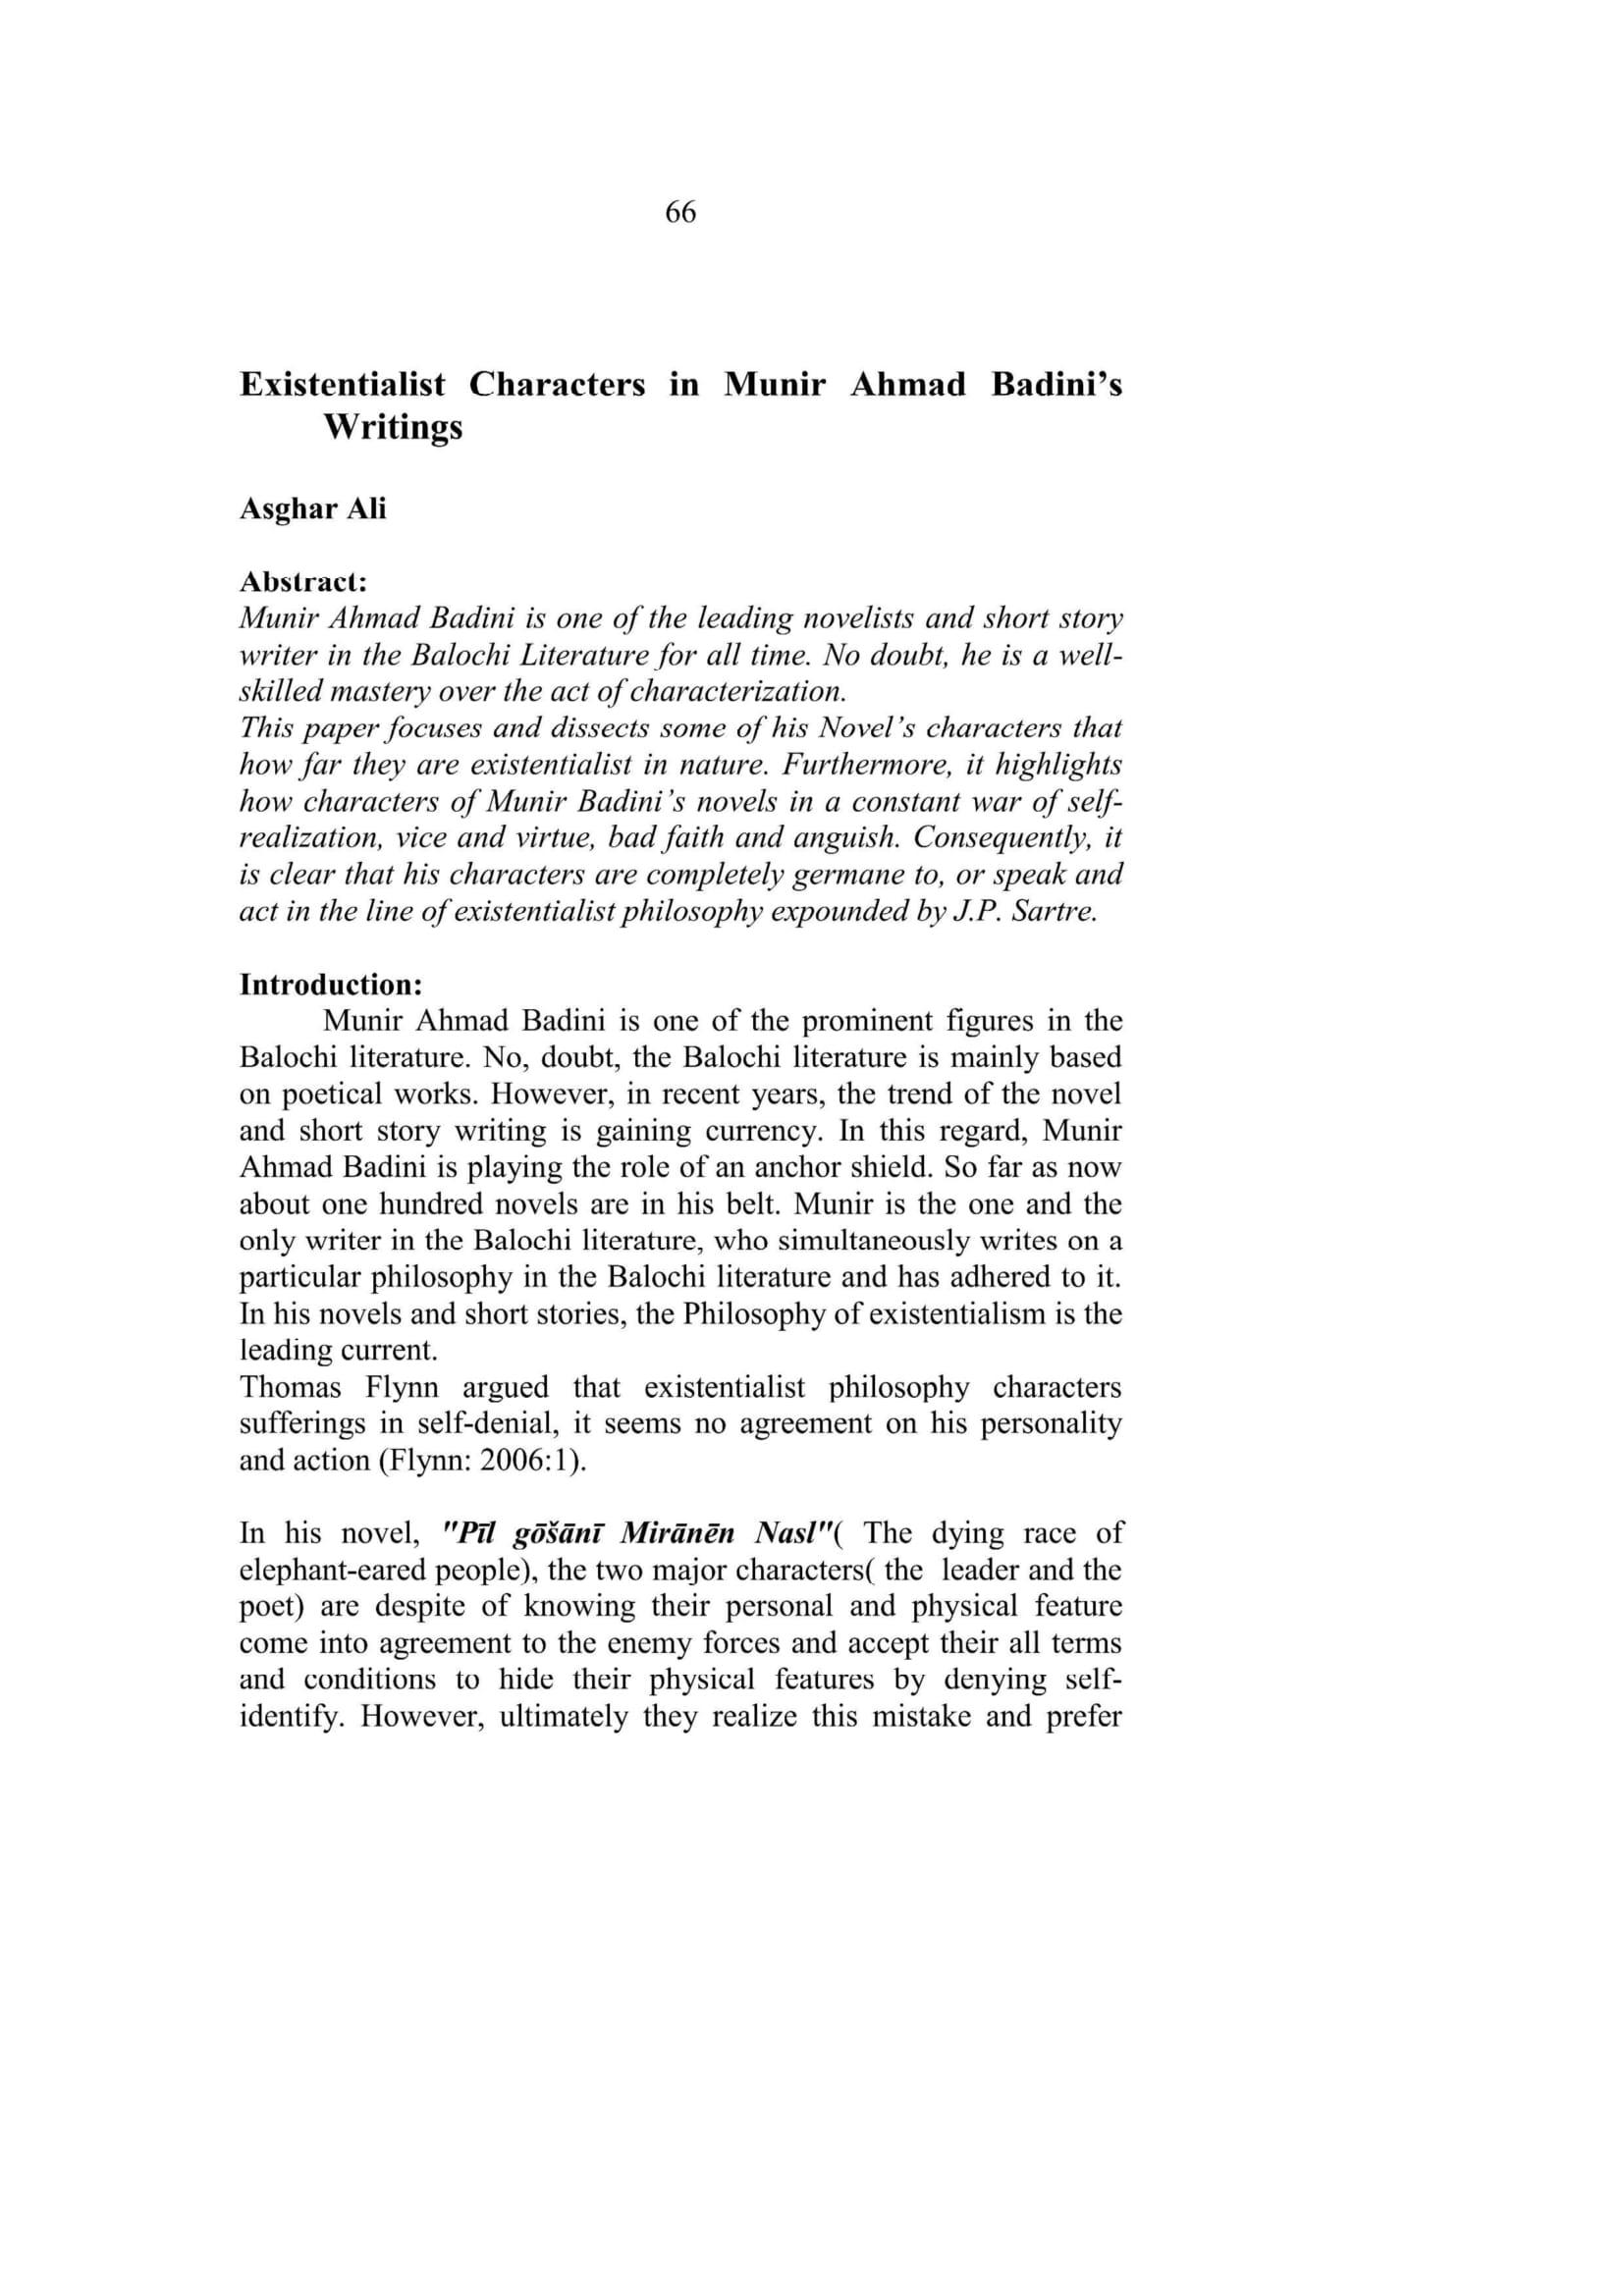 Existentialist Characters in Munir Ahmad Badini's Writings